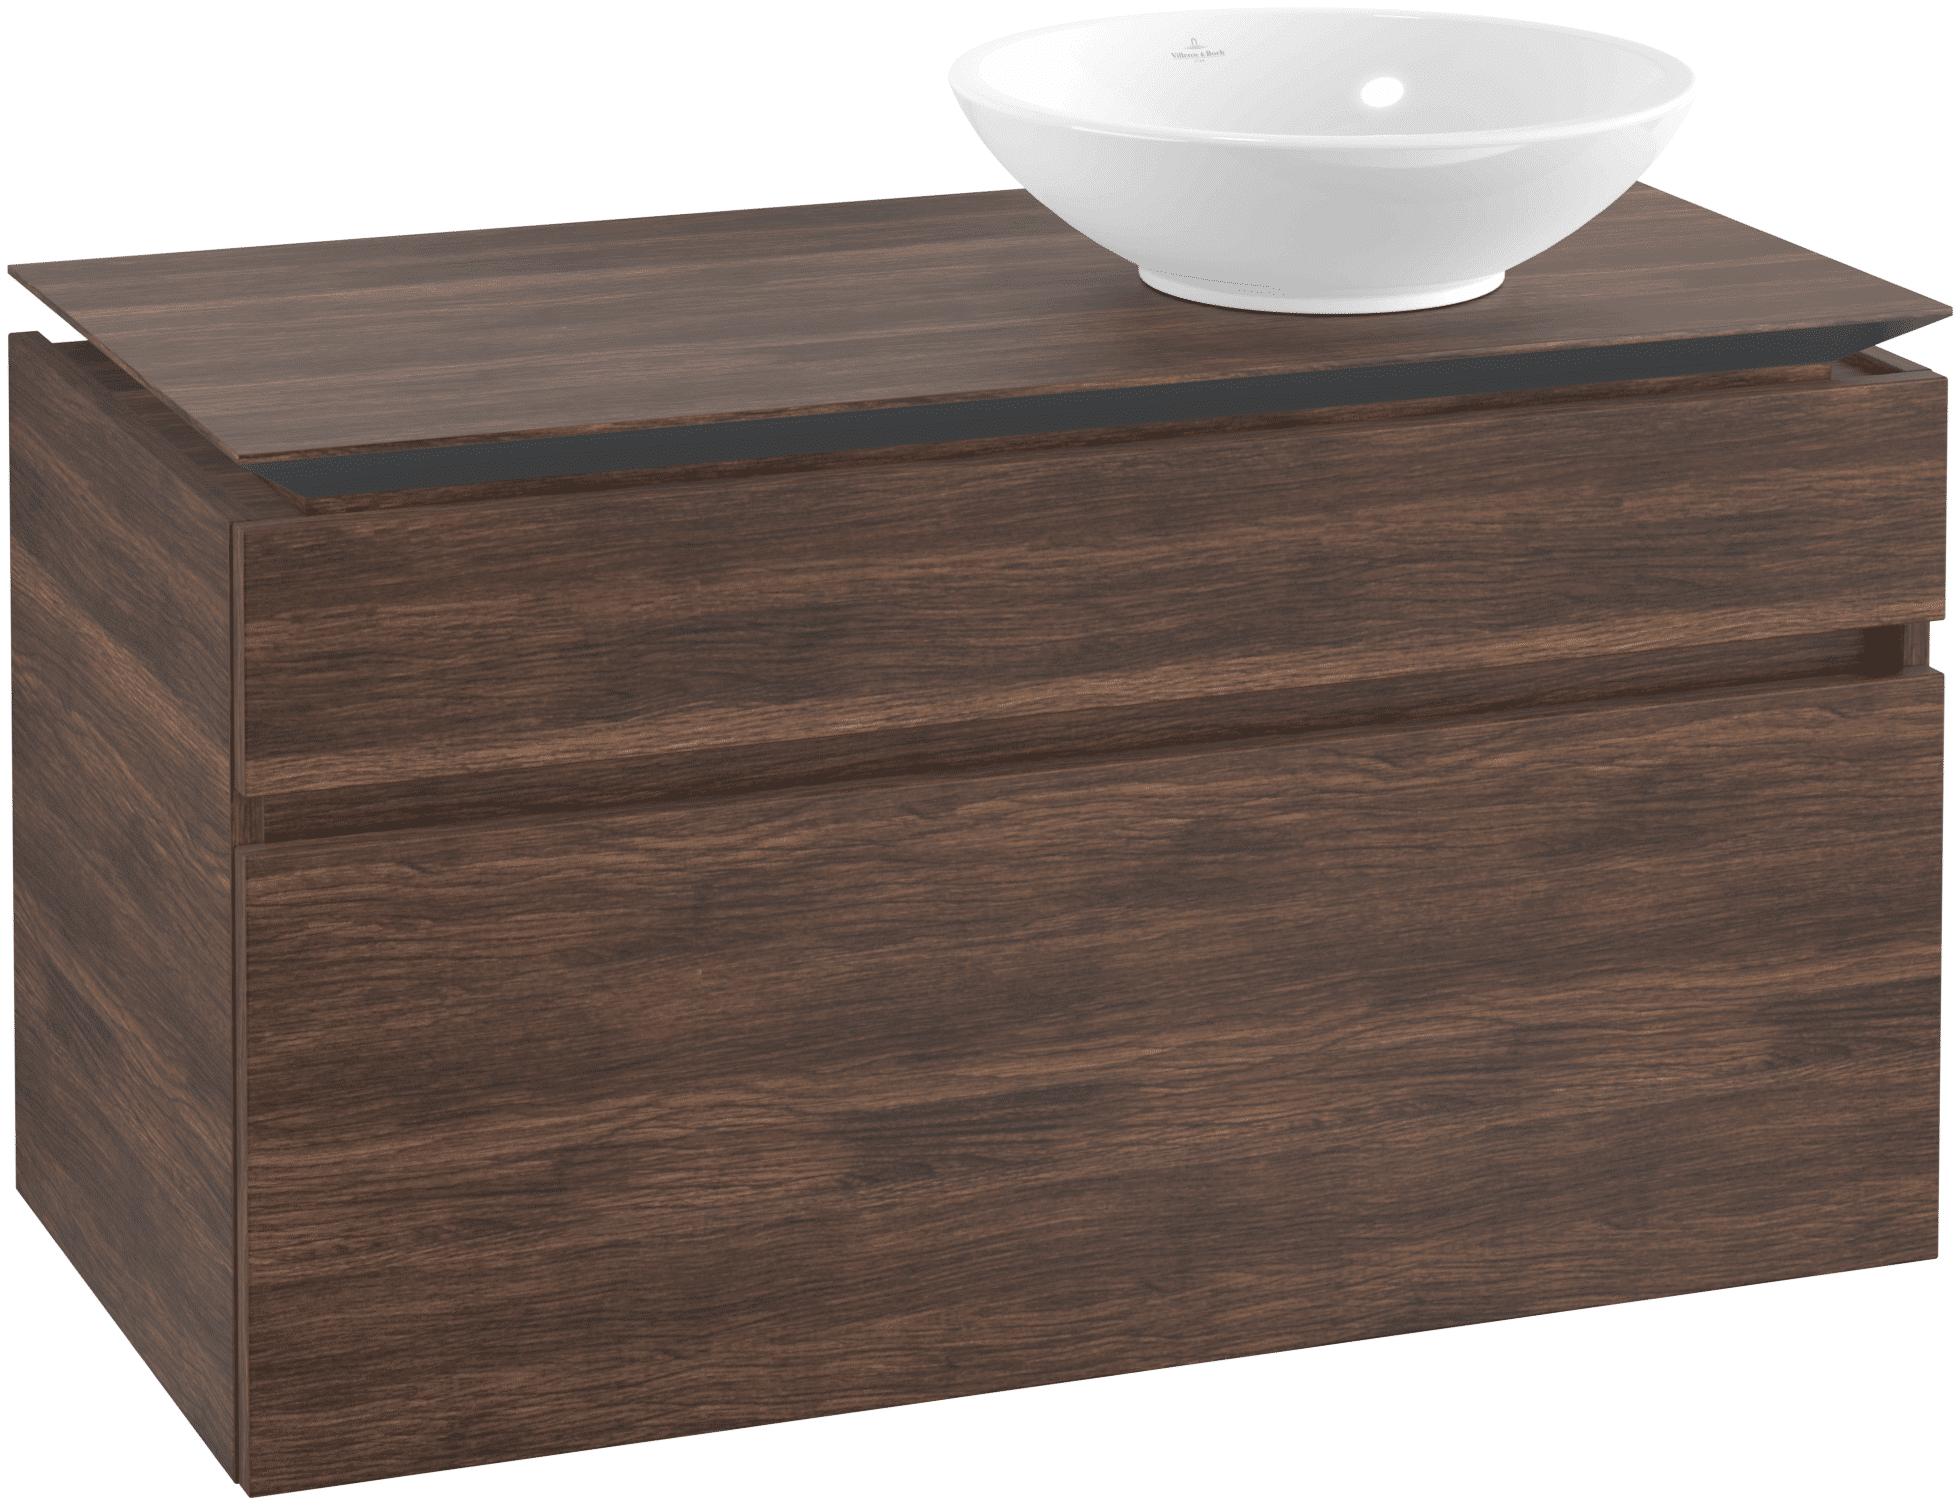 Villeroy & Boch Villeroy & Boch Legato - Meuble sous lavabo with 2 drawers & 1 cut-out right 1000 x 550 x 500mm arizona oak